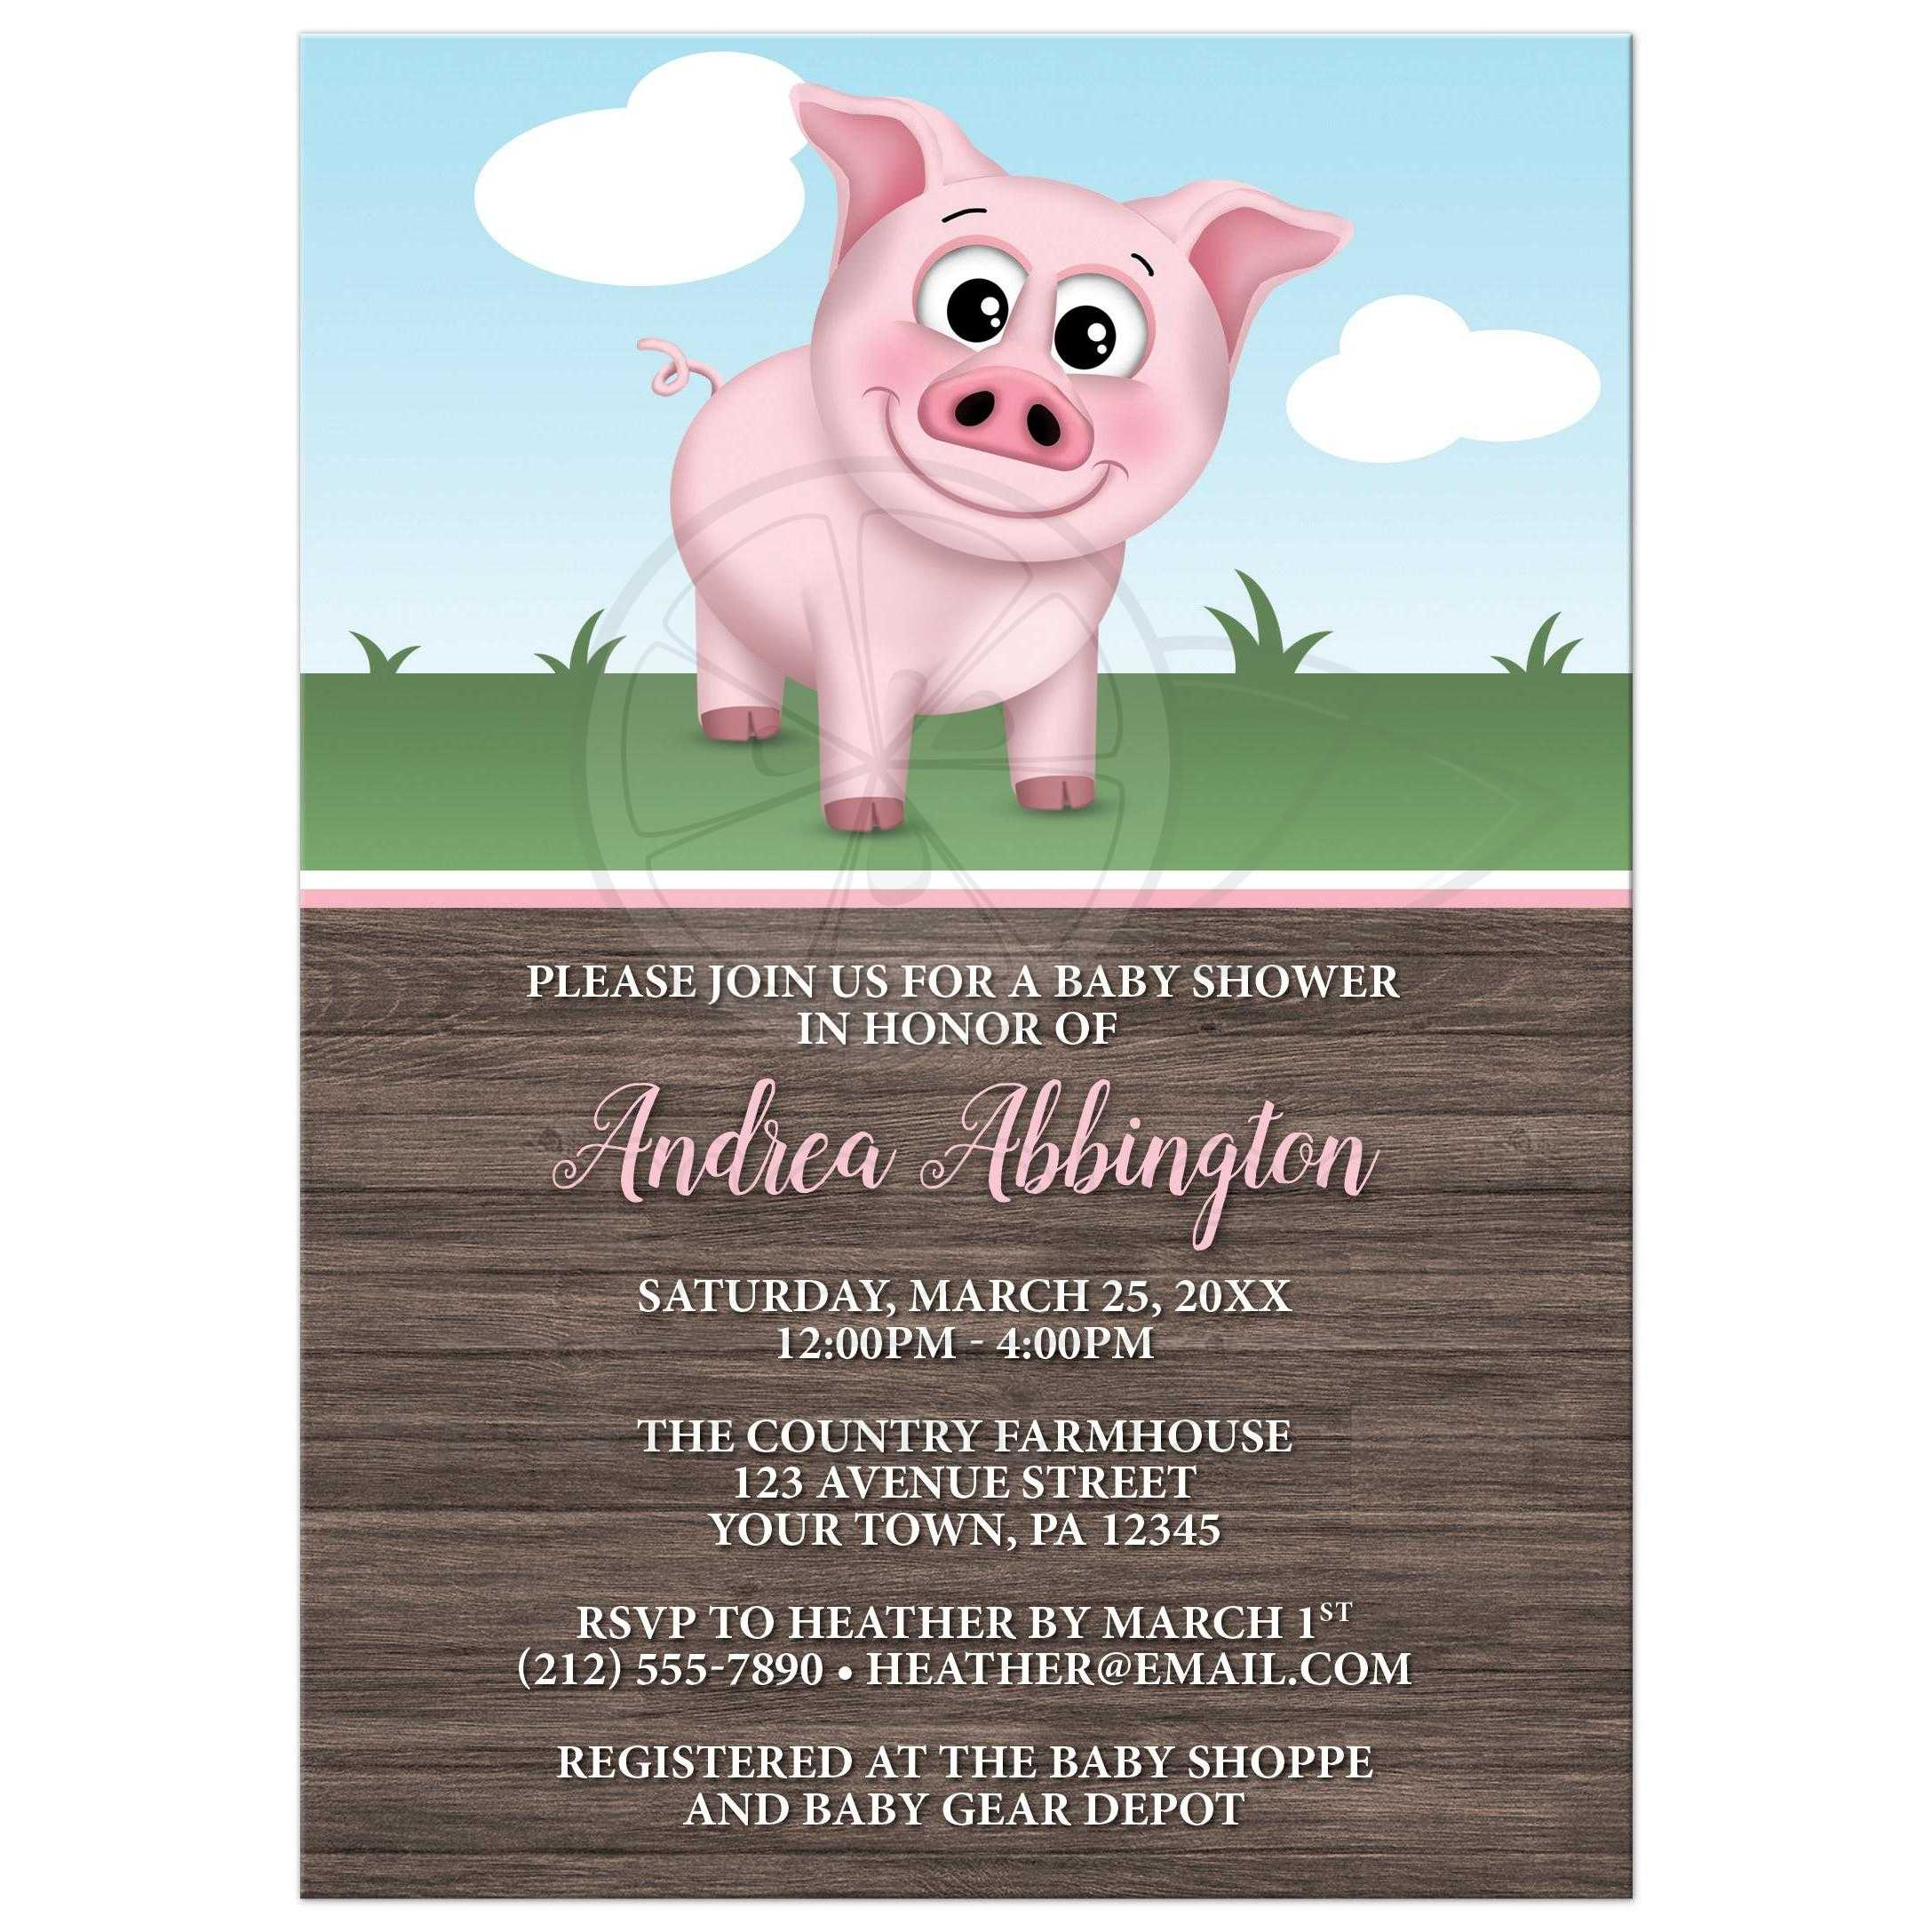 Baby Shower Invitations - Happy Pink Pig on the Farm - Barnyard